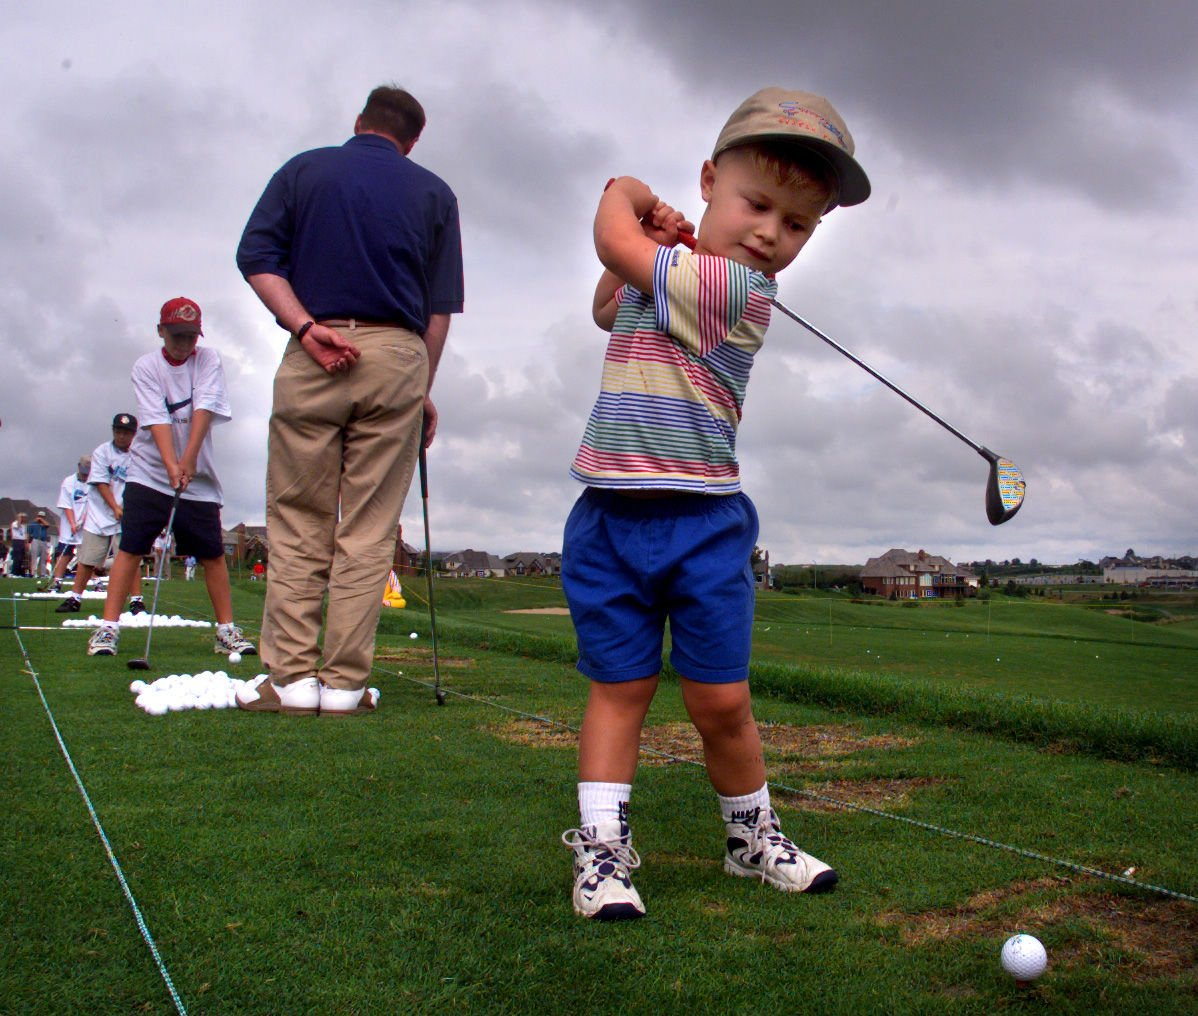 Family Golf Days